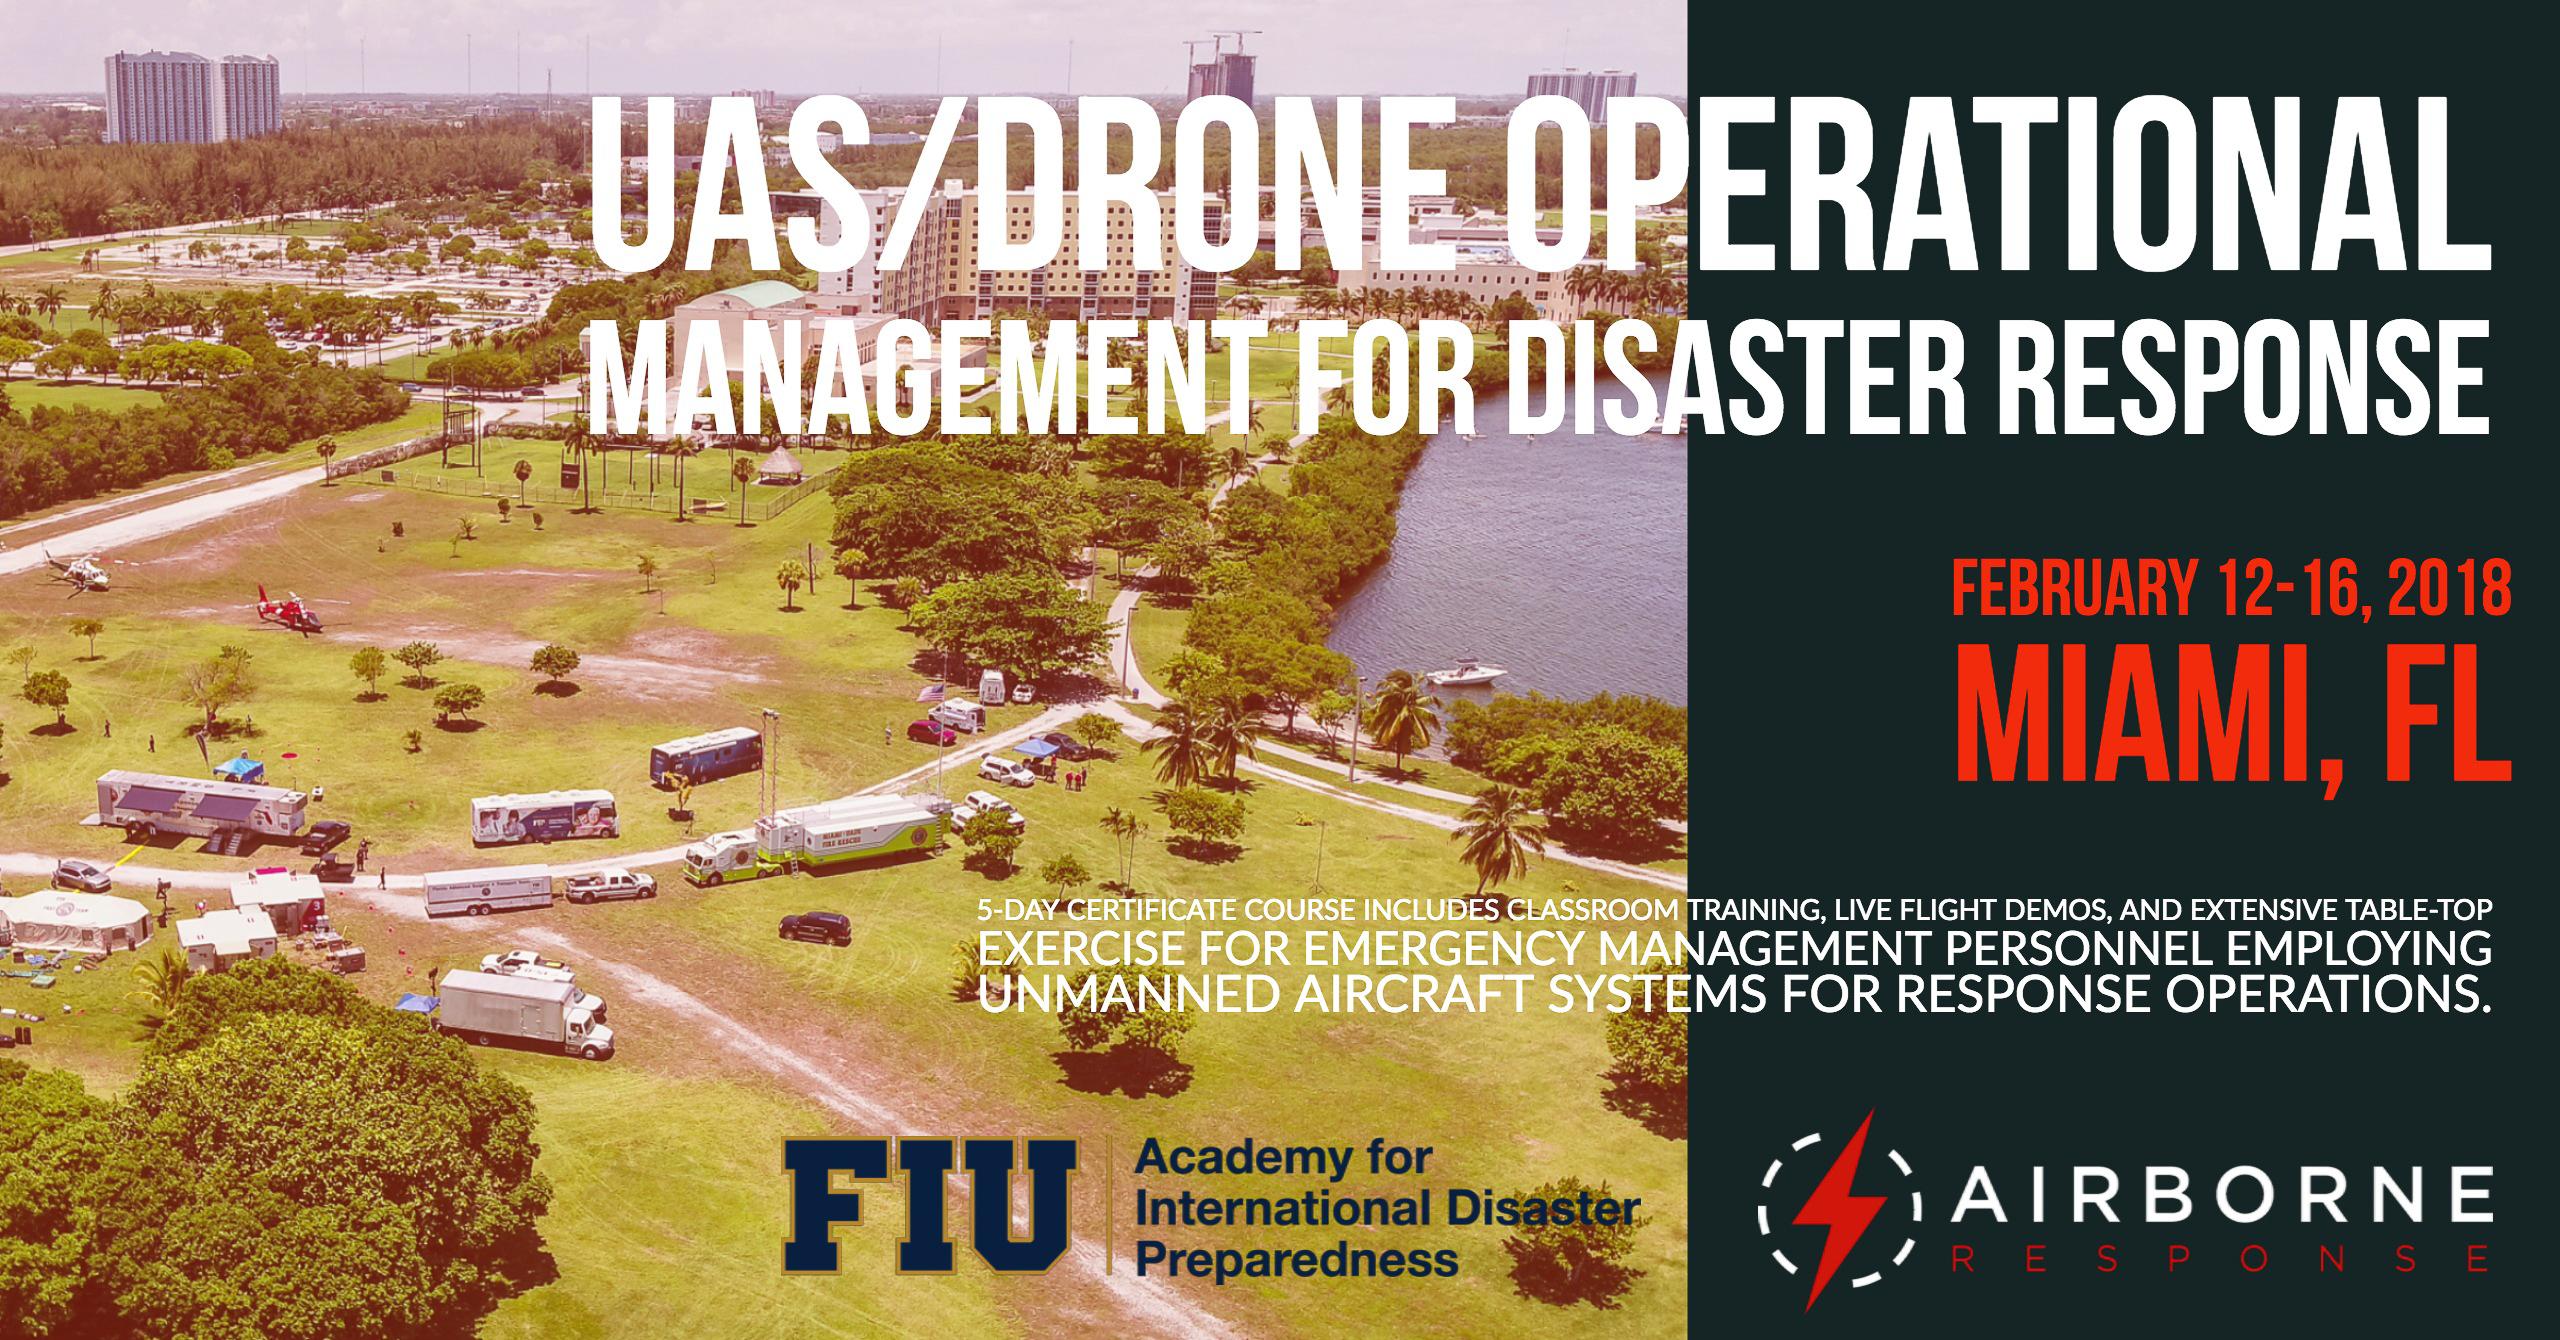 Florida international university launches new course offerings florida international university launches new course offerings highli airborne response 1betcityfo Gallery